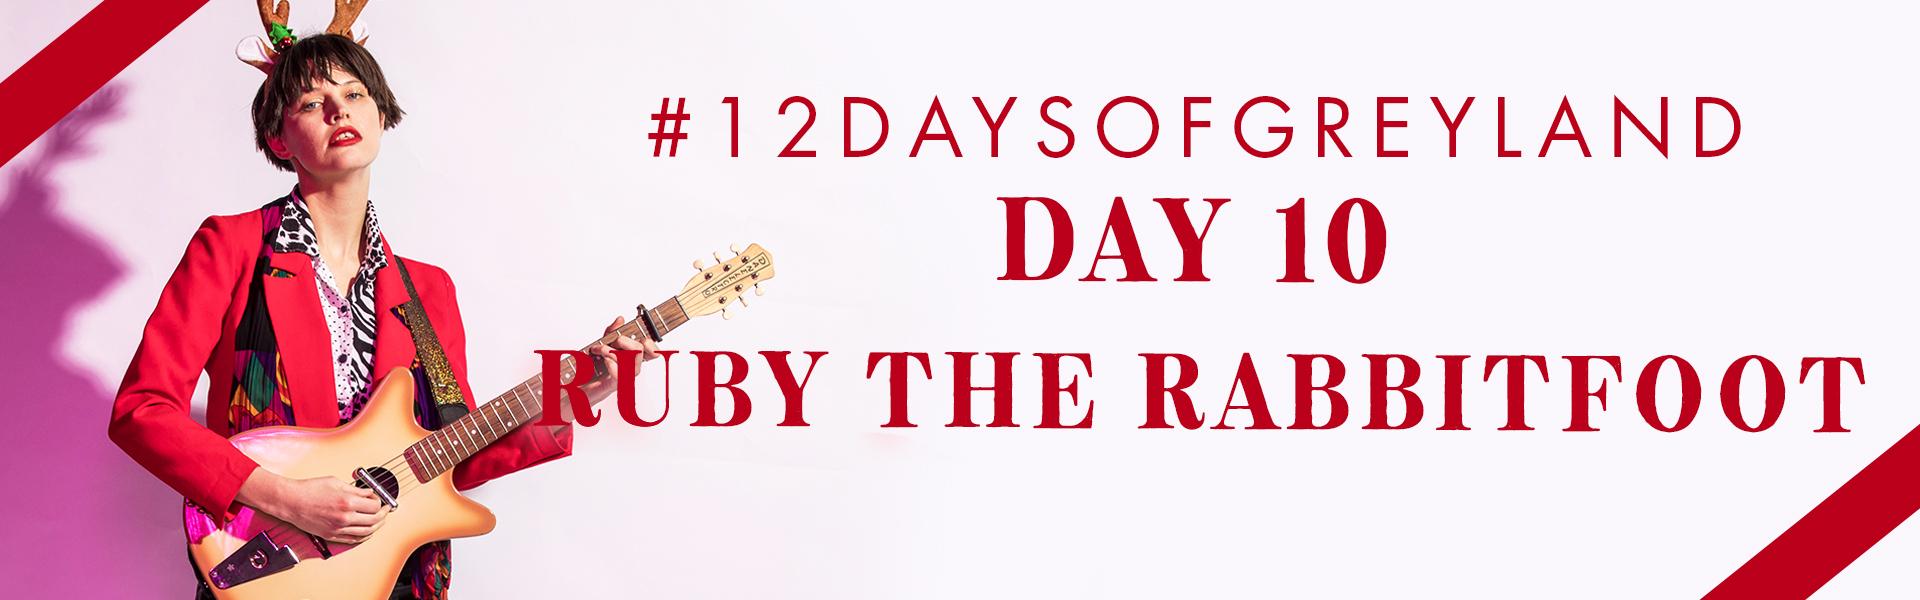 12days_ruby_banner.jpg